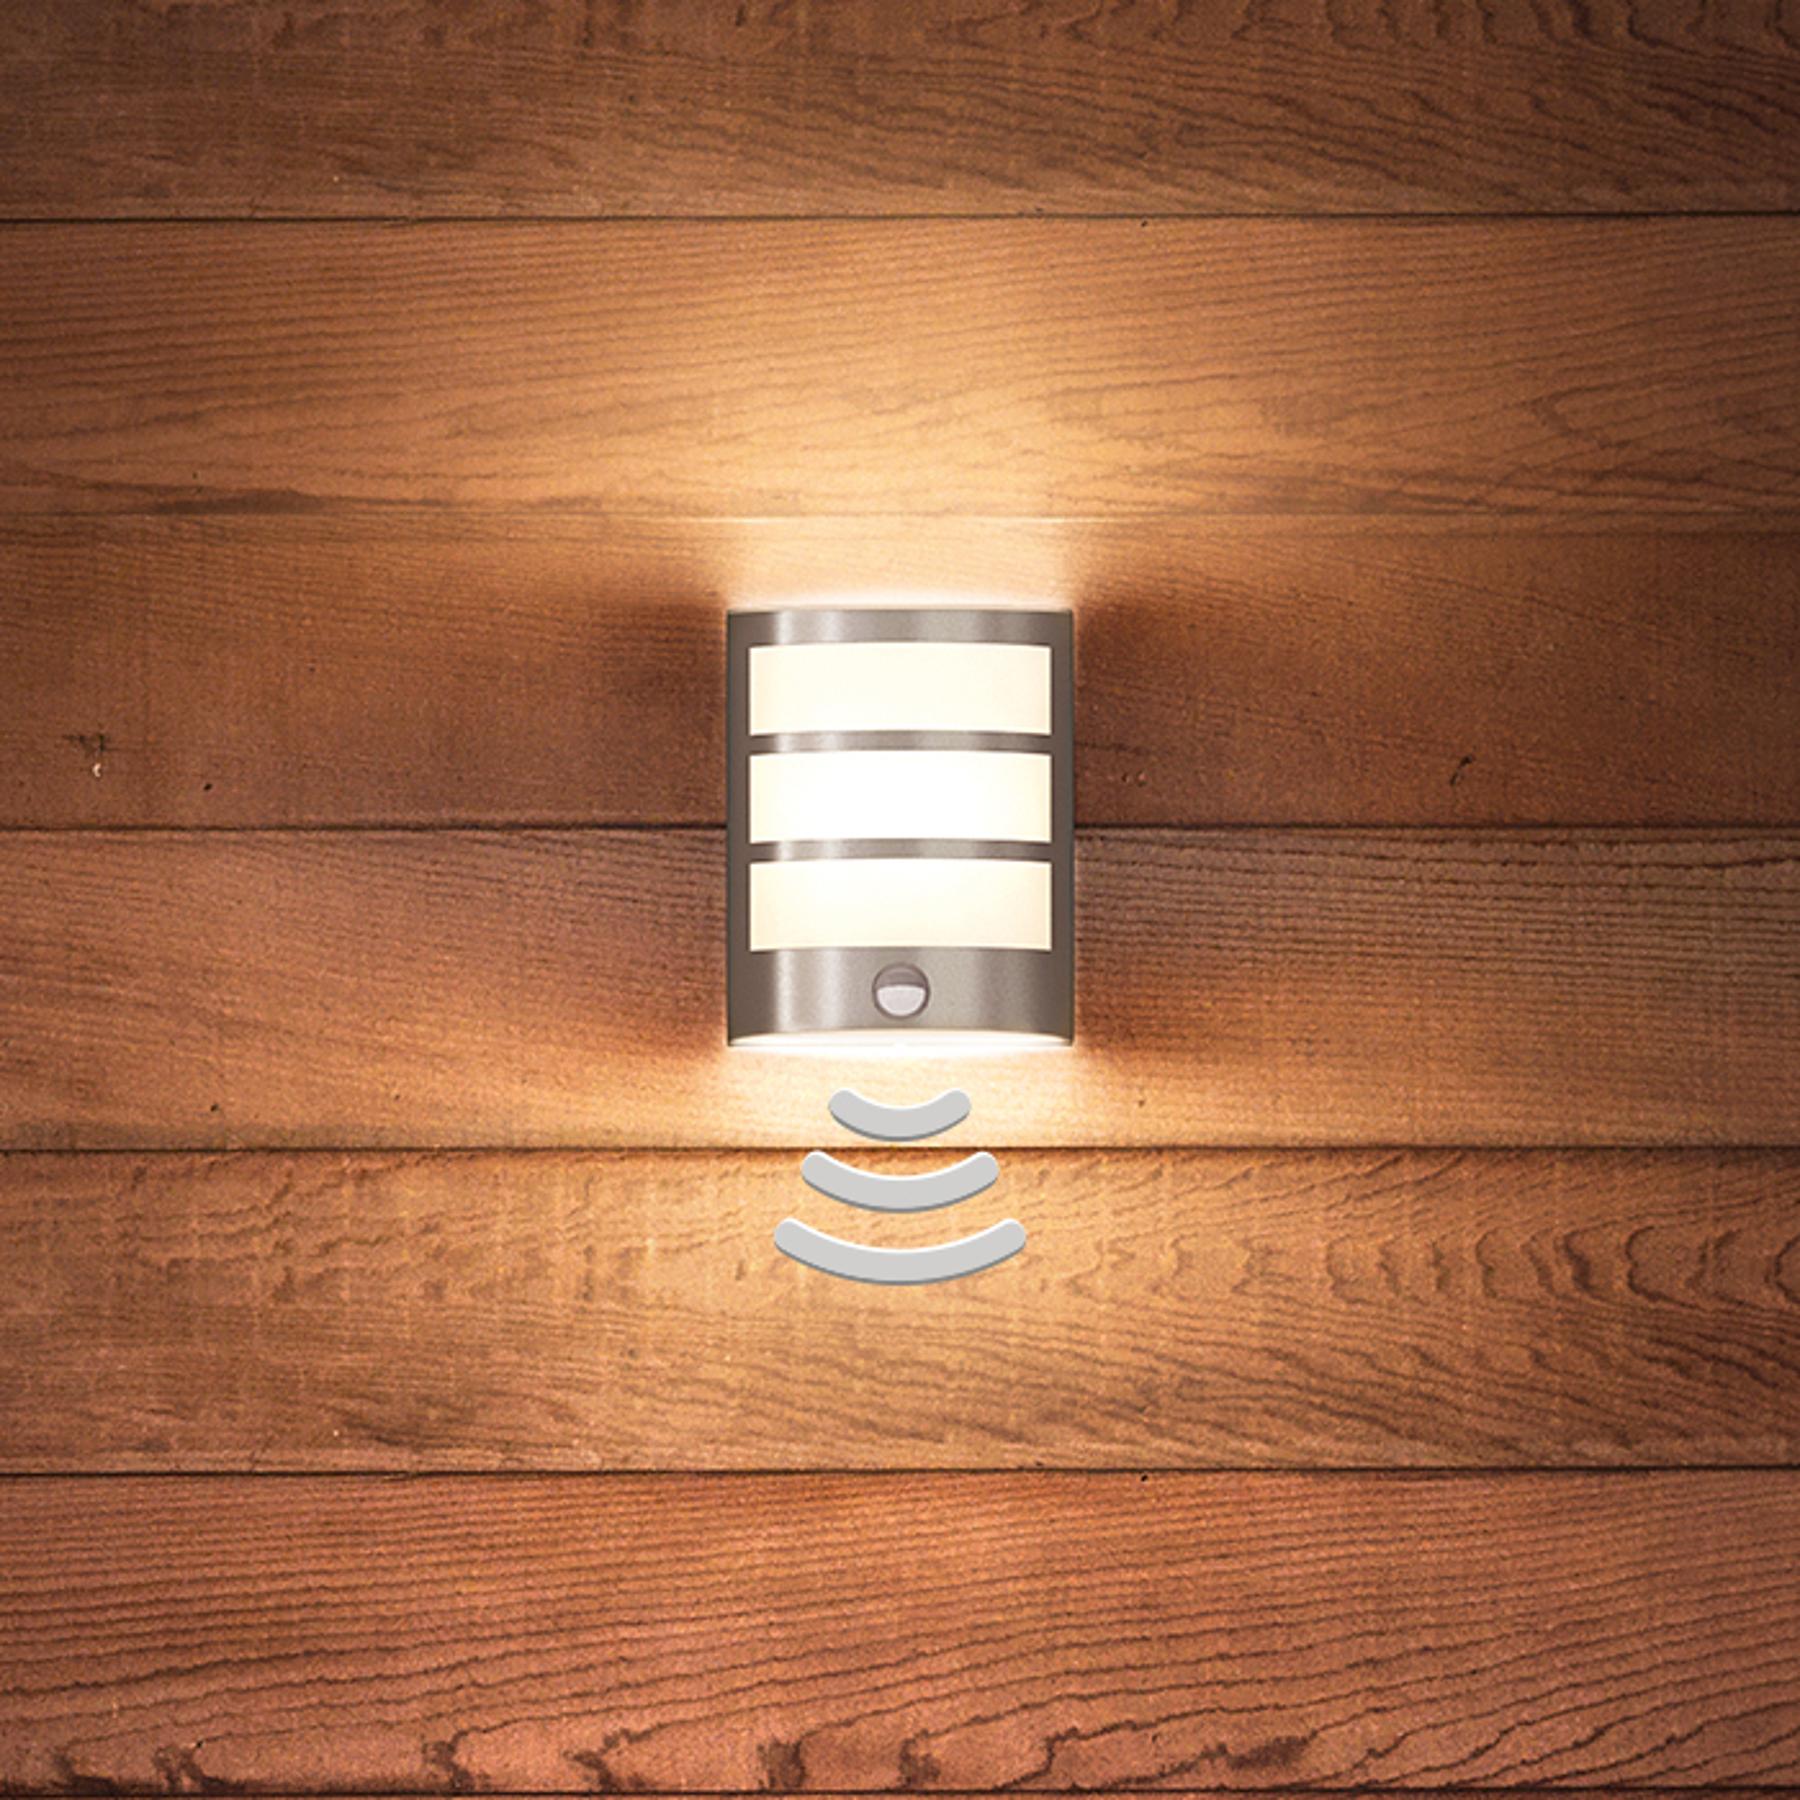 Mooie LED wandlamp Python met bewegingssensor